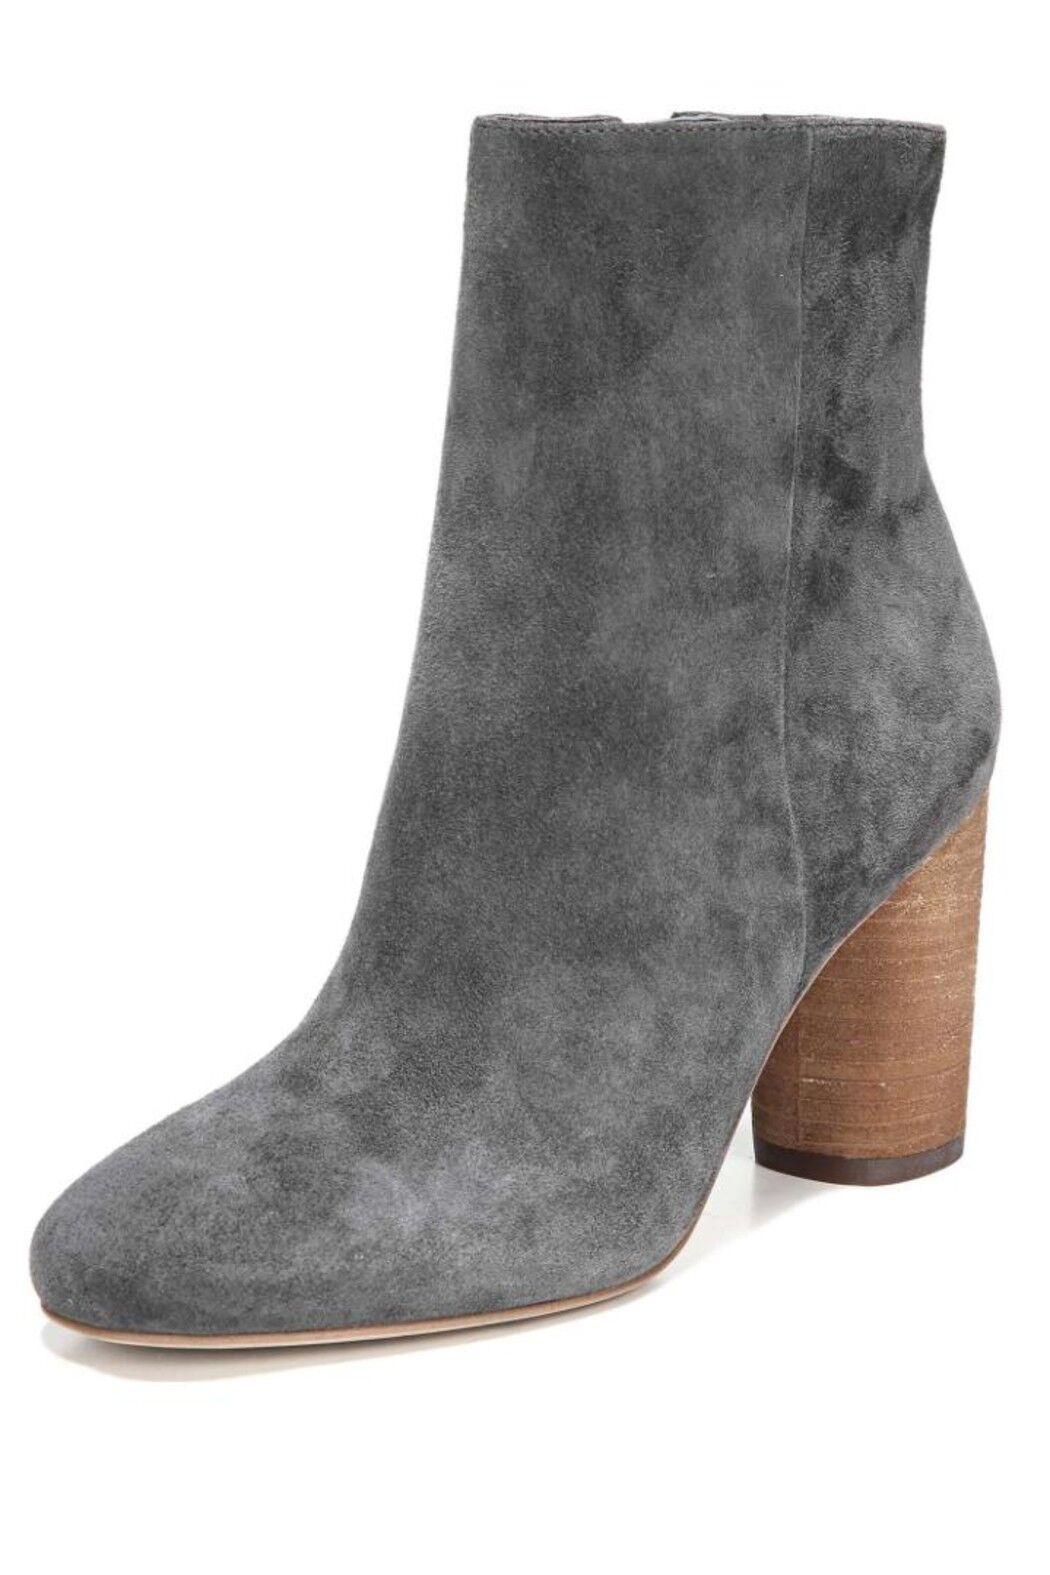 Sam Edelman gris Nuevas botas gris Edelman corra 3fe6db